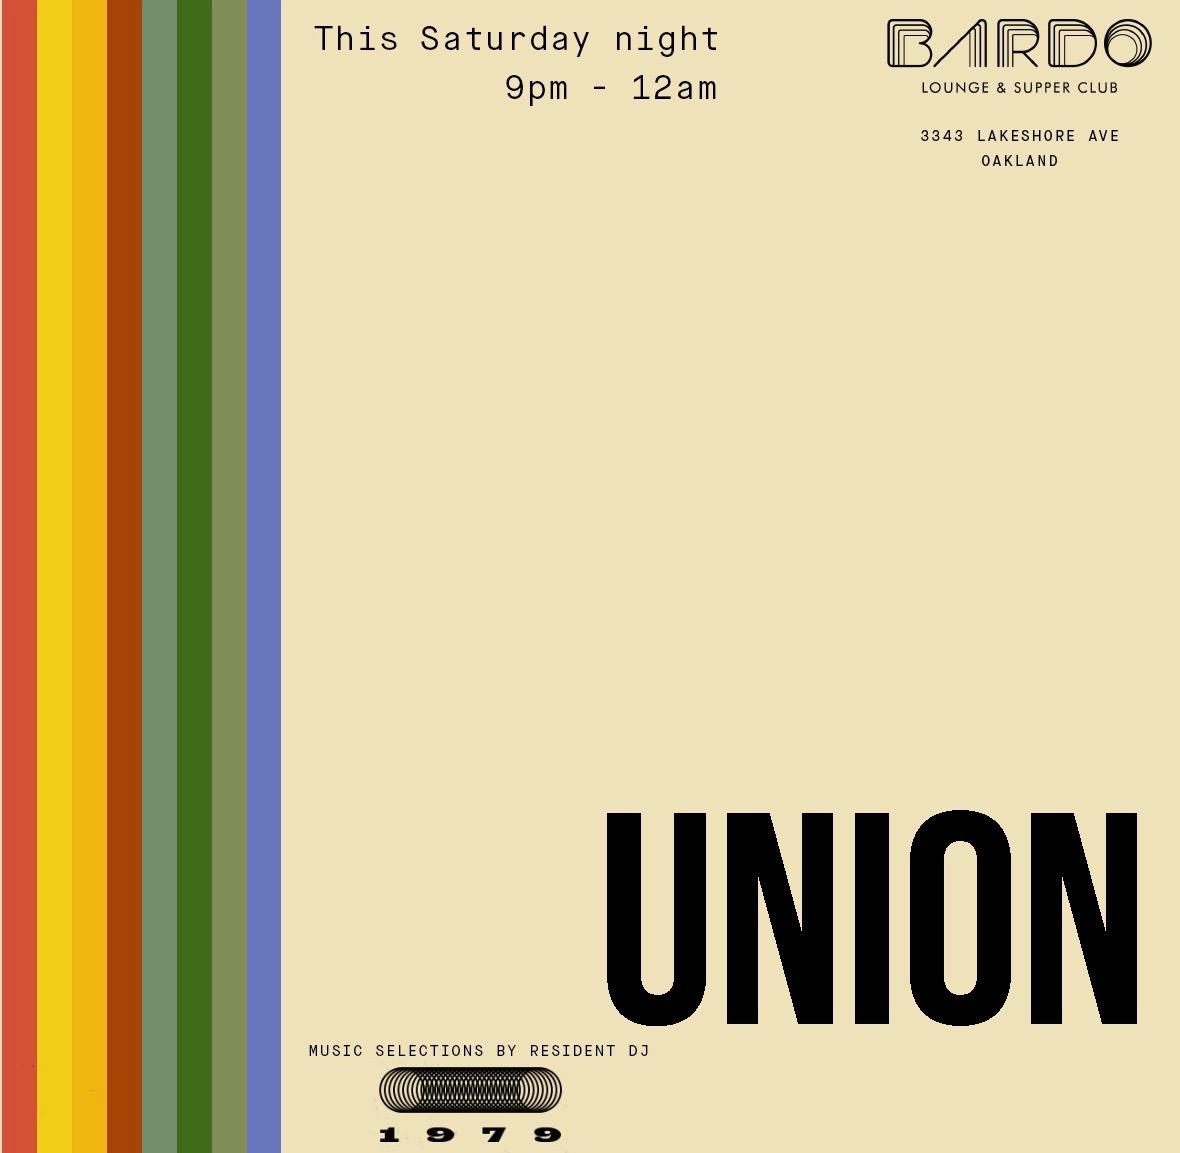 Union July 19.jpg